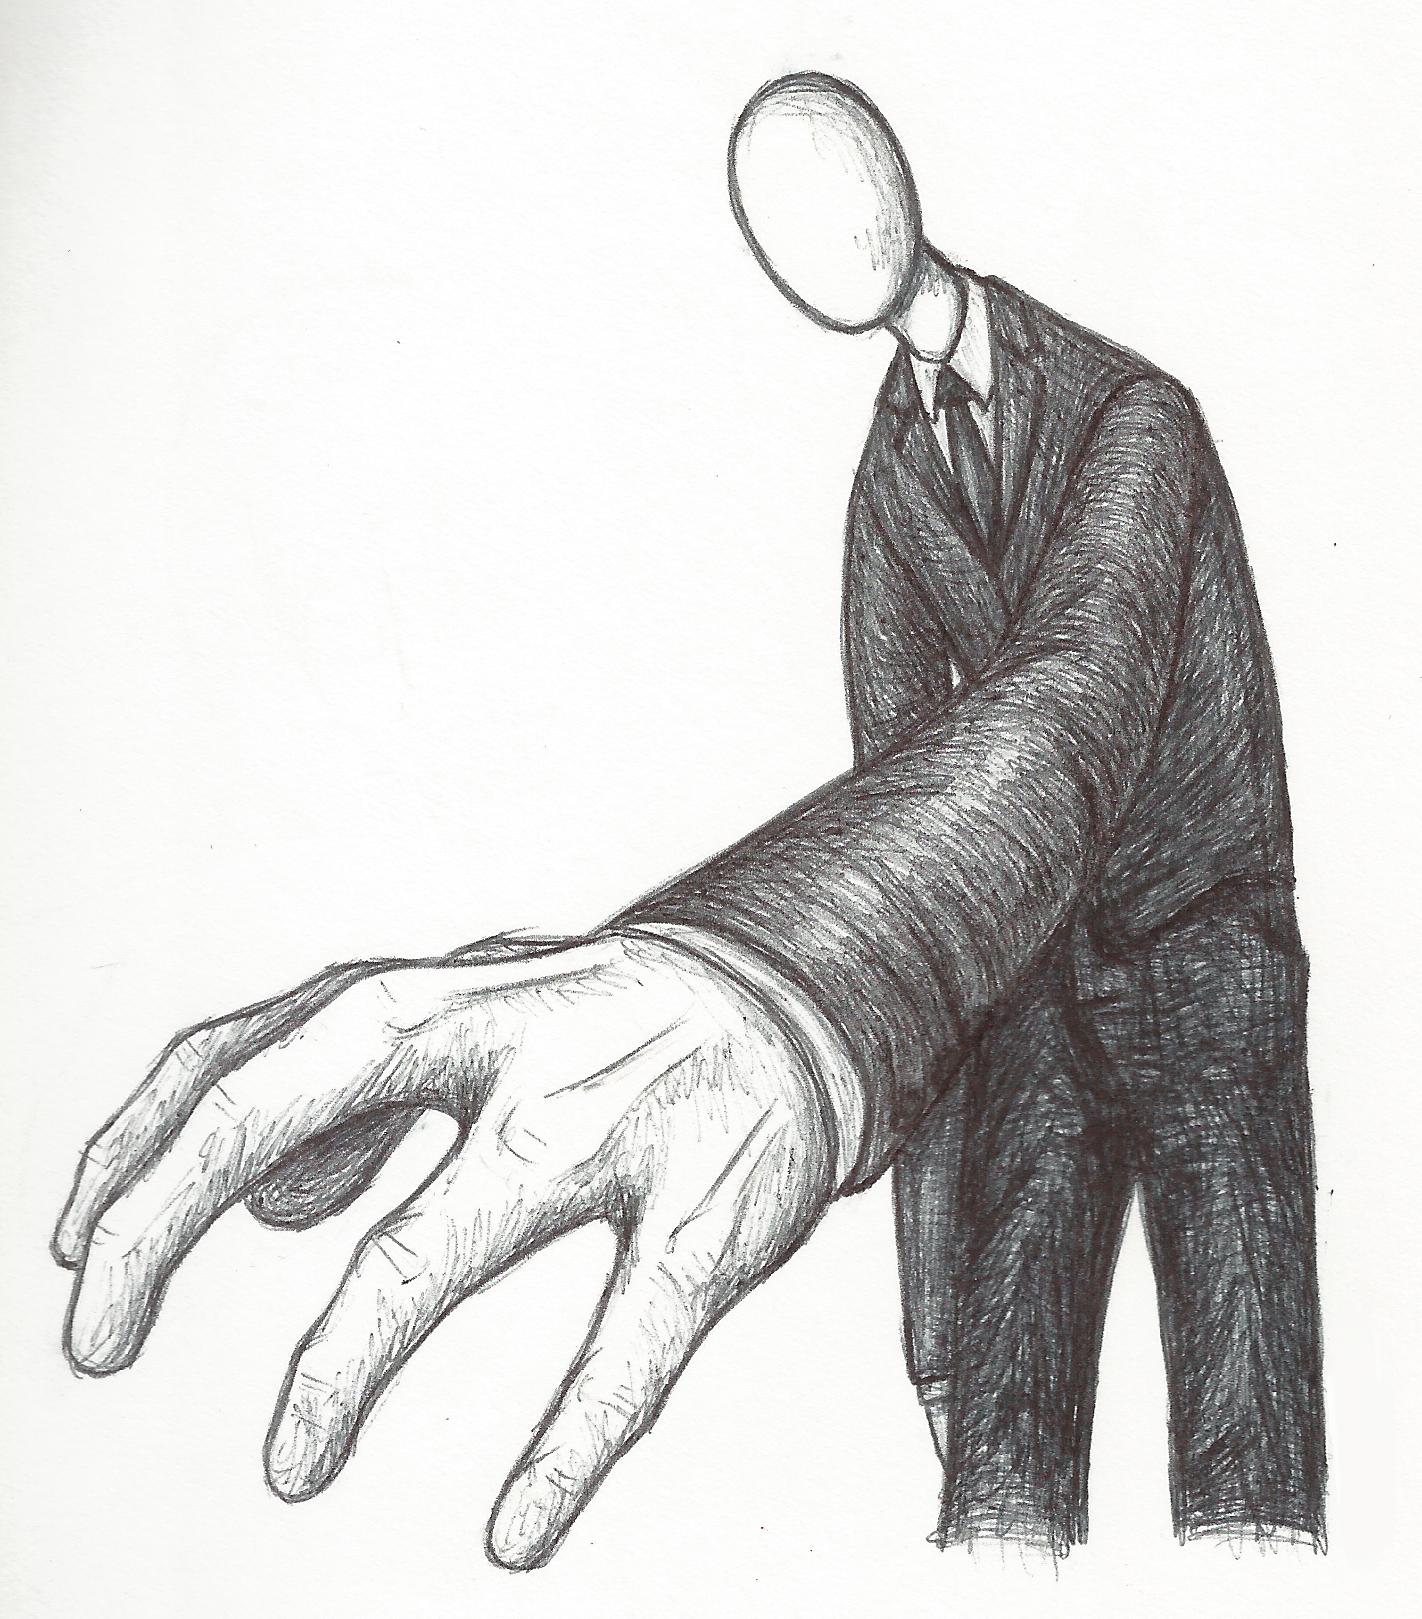 Reaching (still) [NOT CREEPYPASTA] by CuryPotato